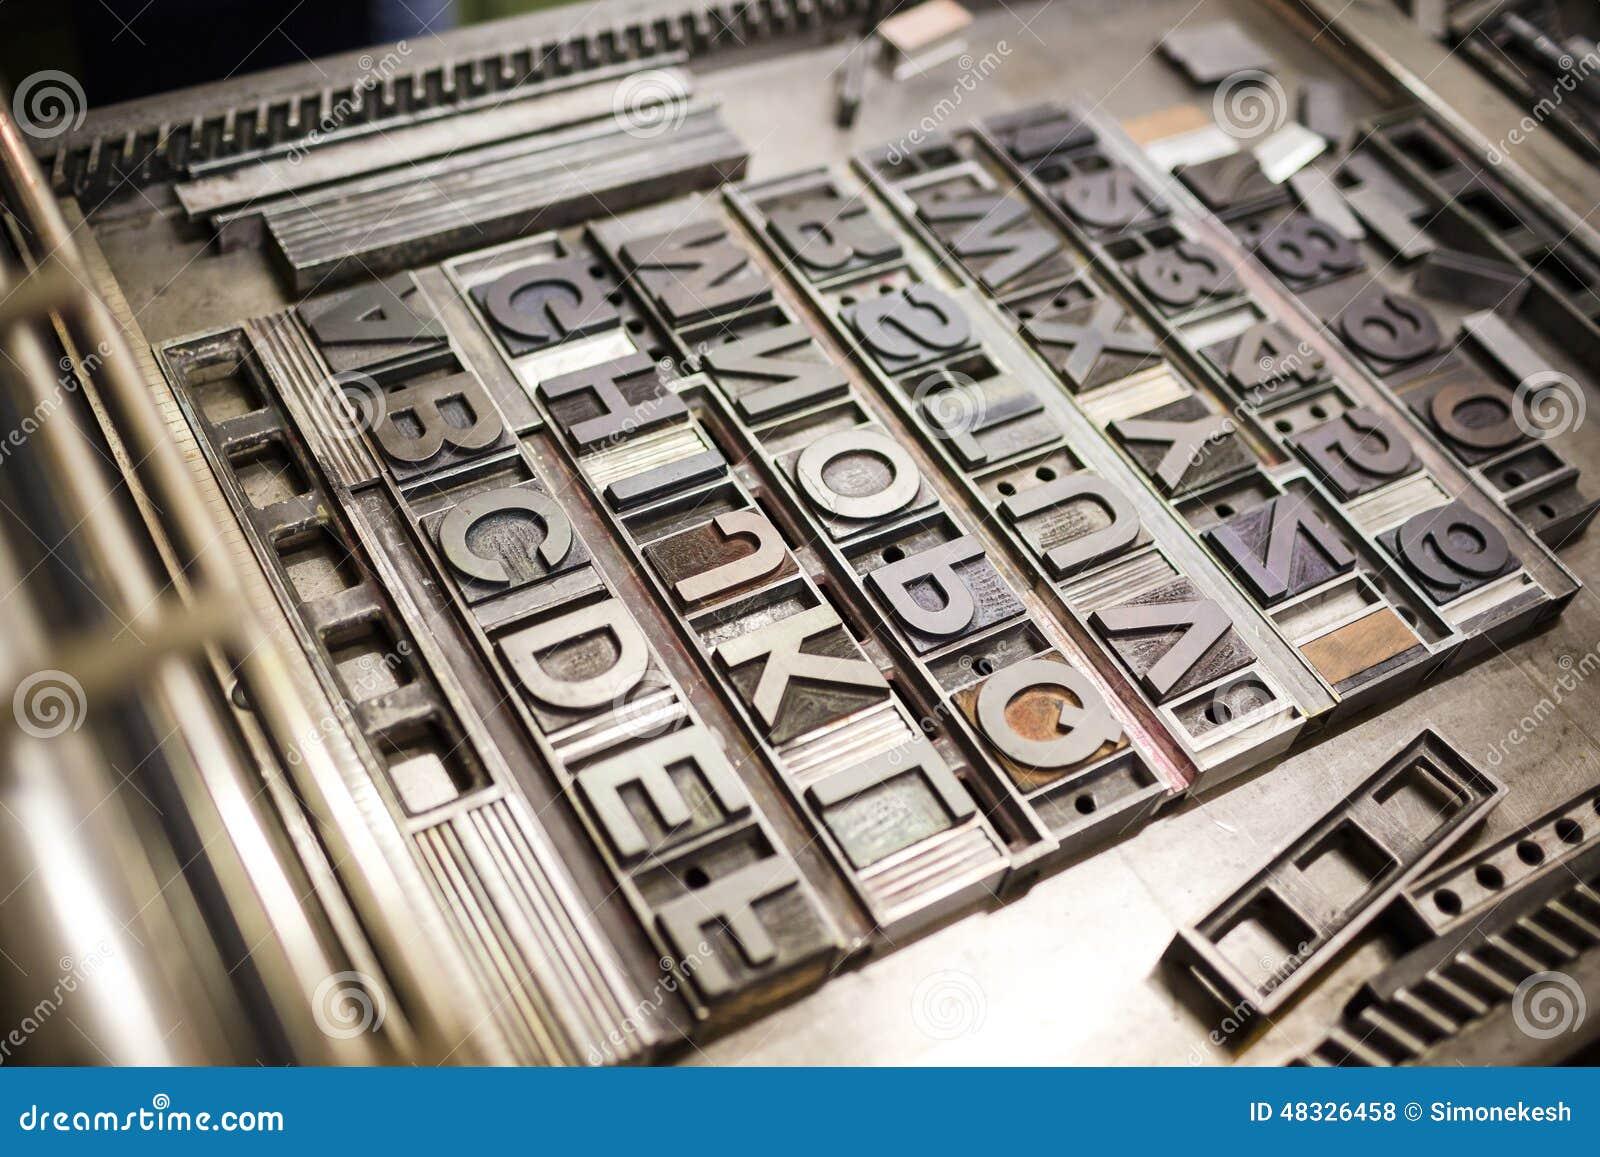 image gallery typographie machine